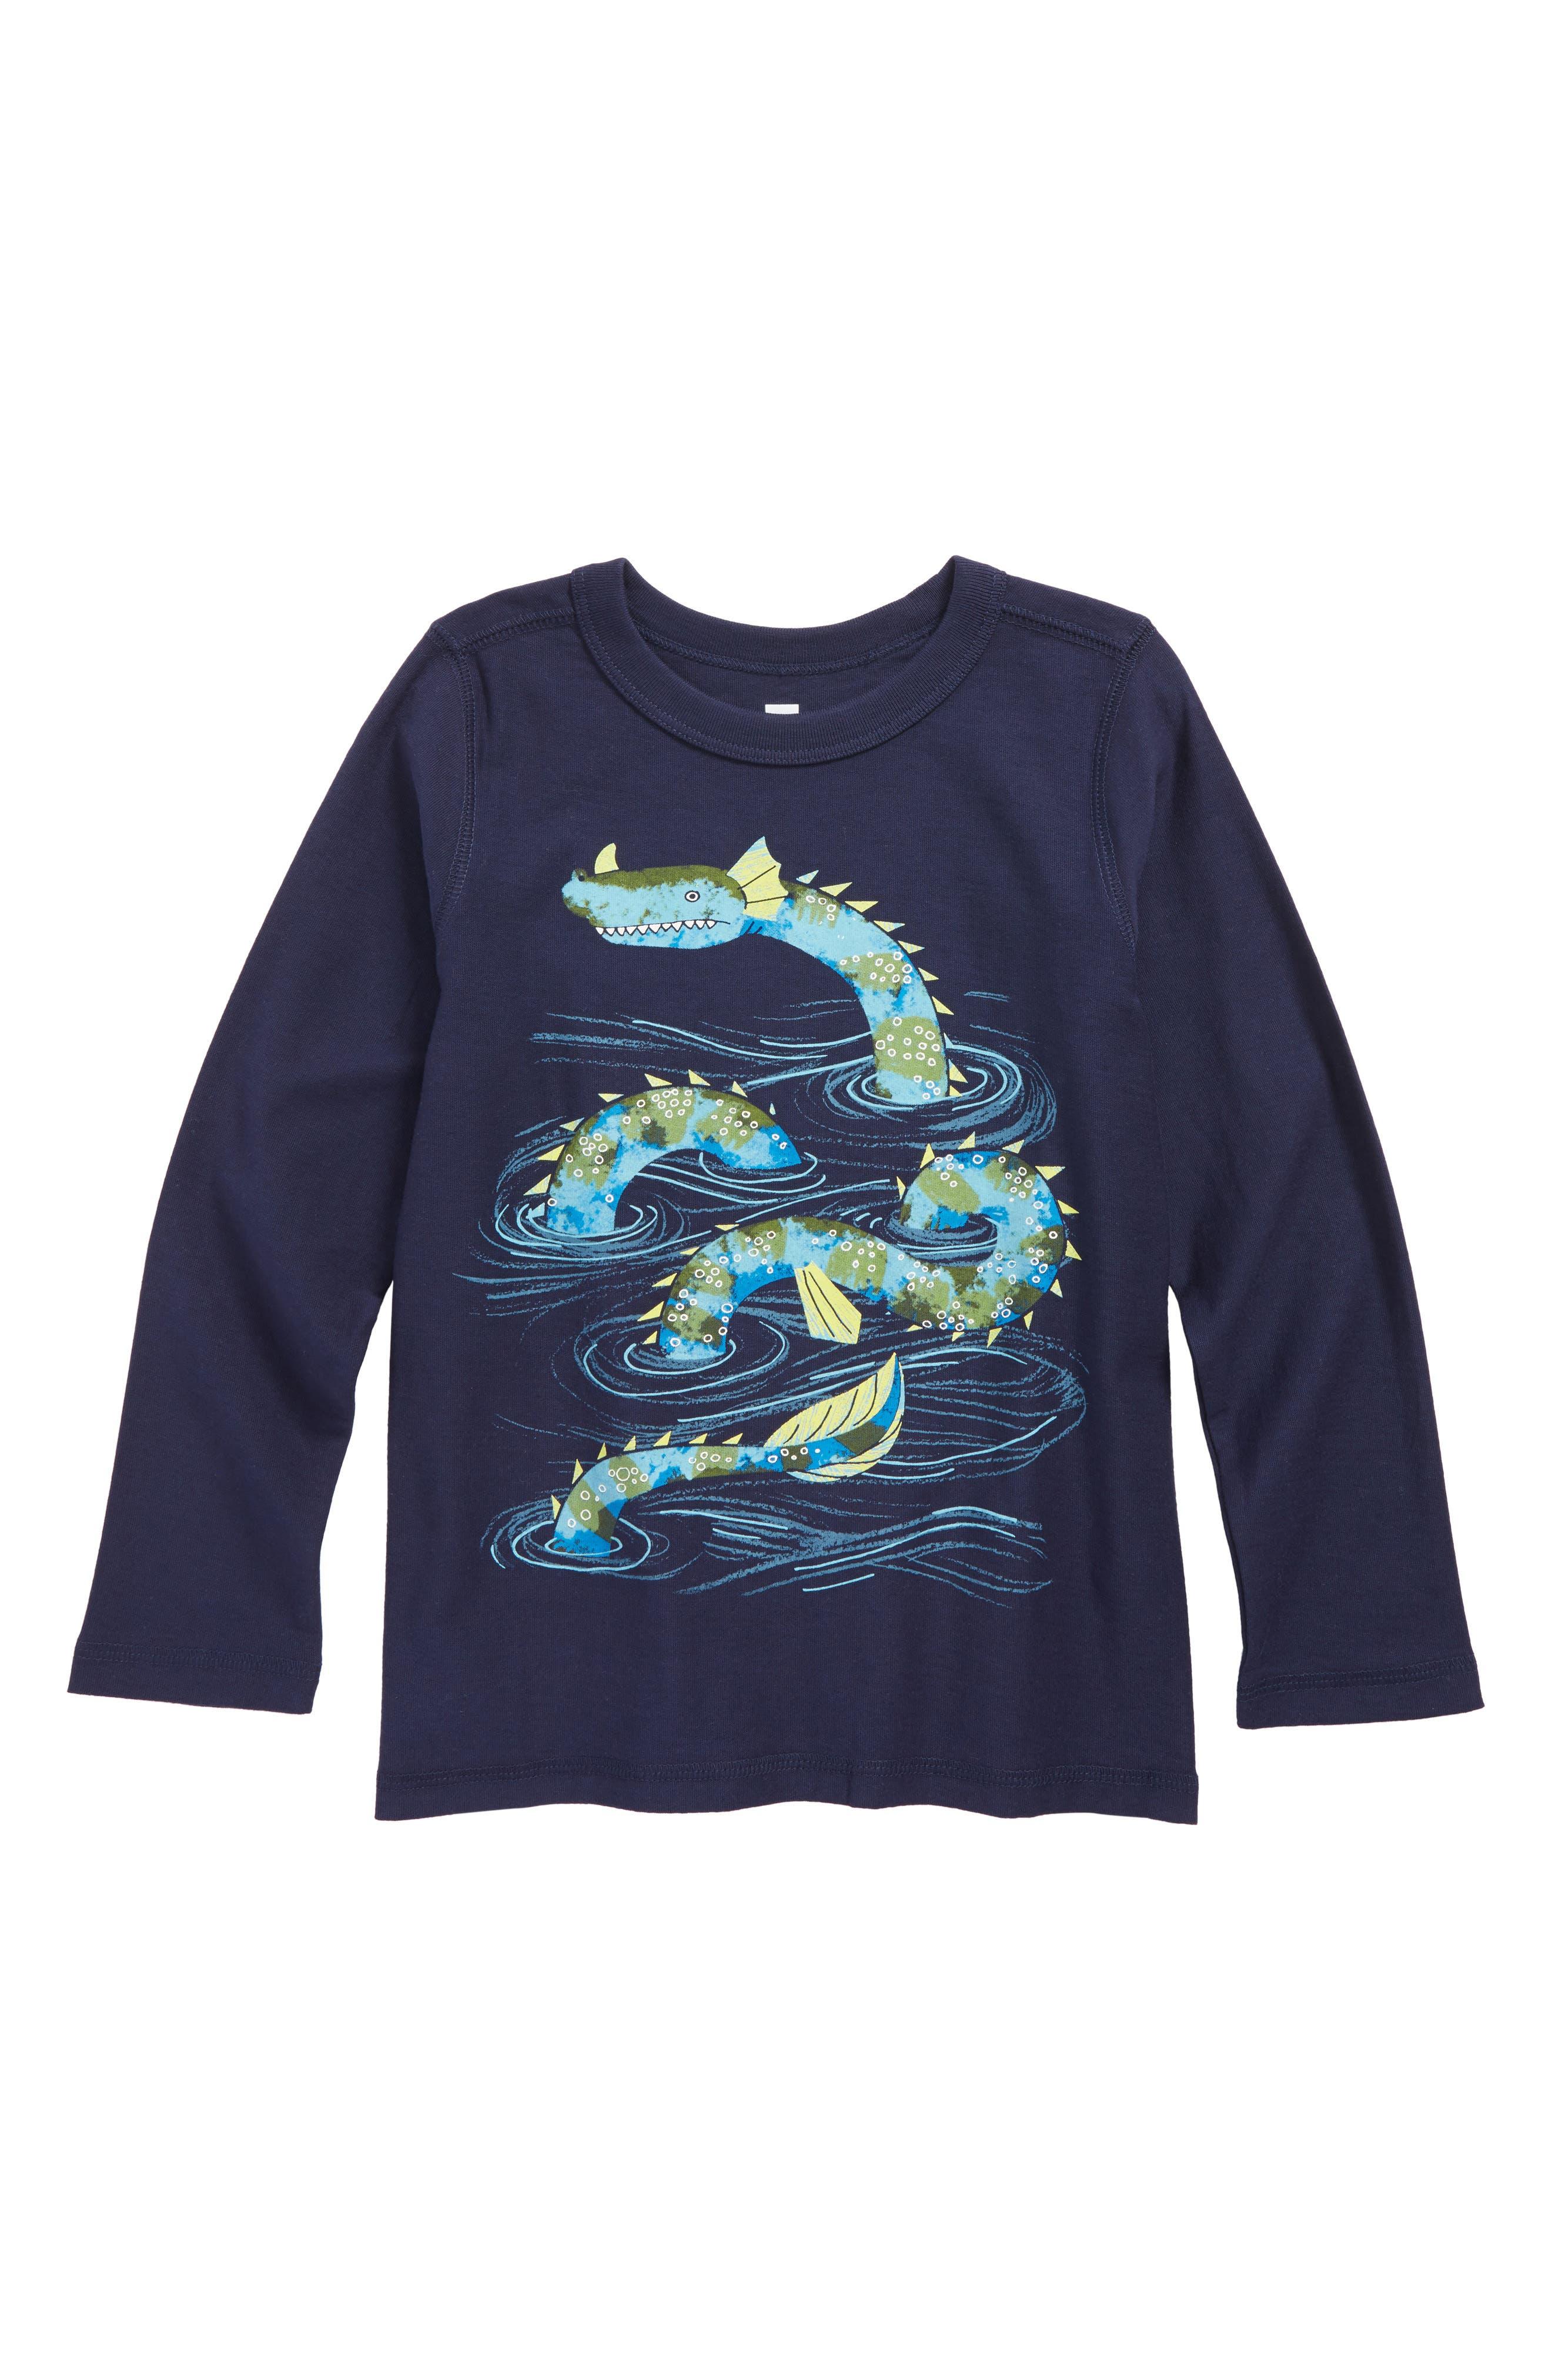 Tea Collection Loch Ness T-Shirt (Toddler Boys & Little Boys)